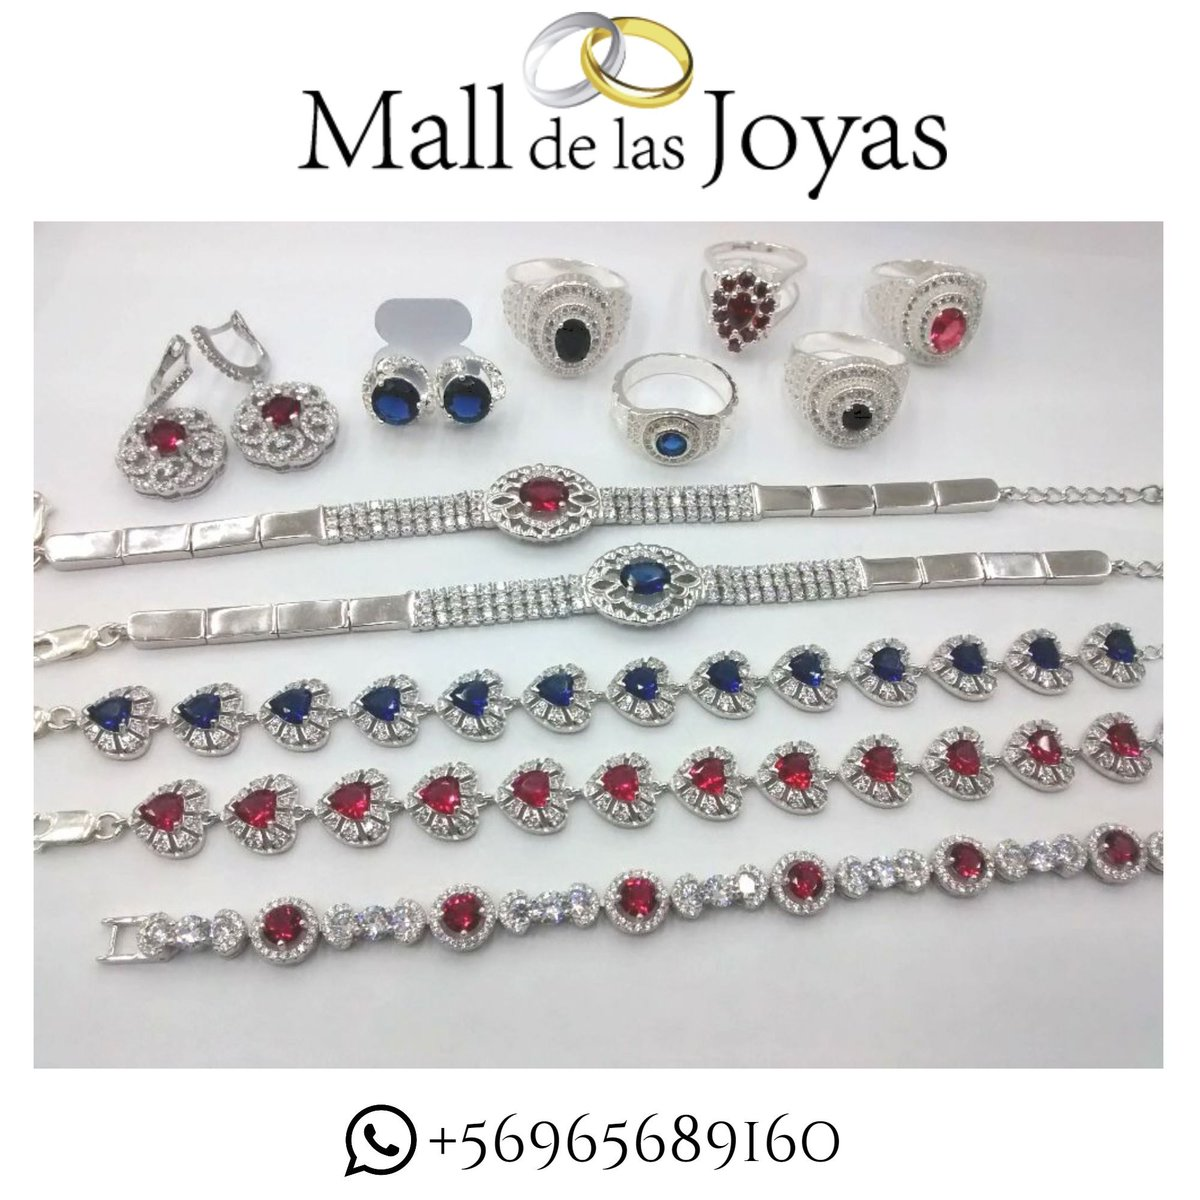 19e16c85190a Mall de las Joyas on Twitter